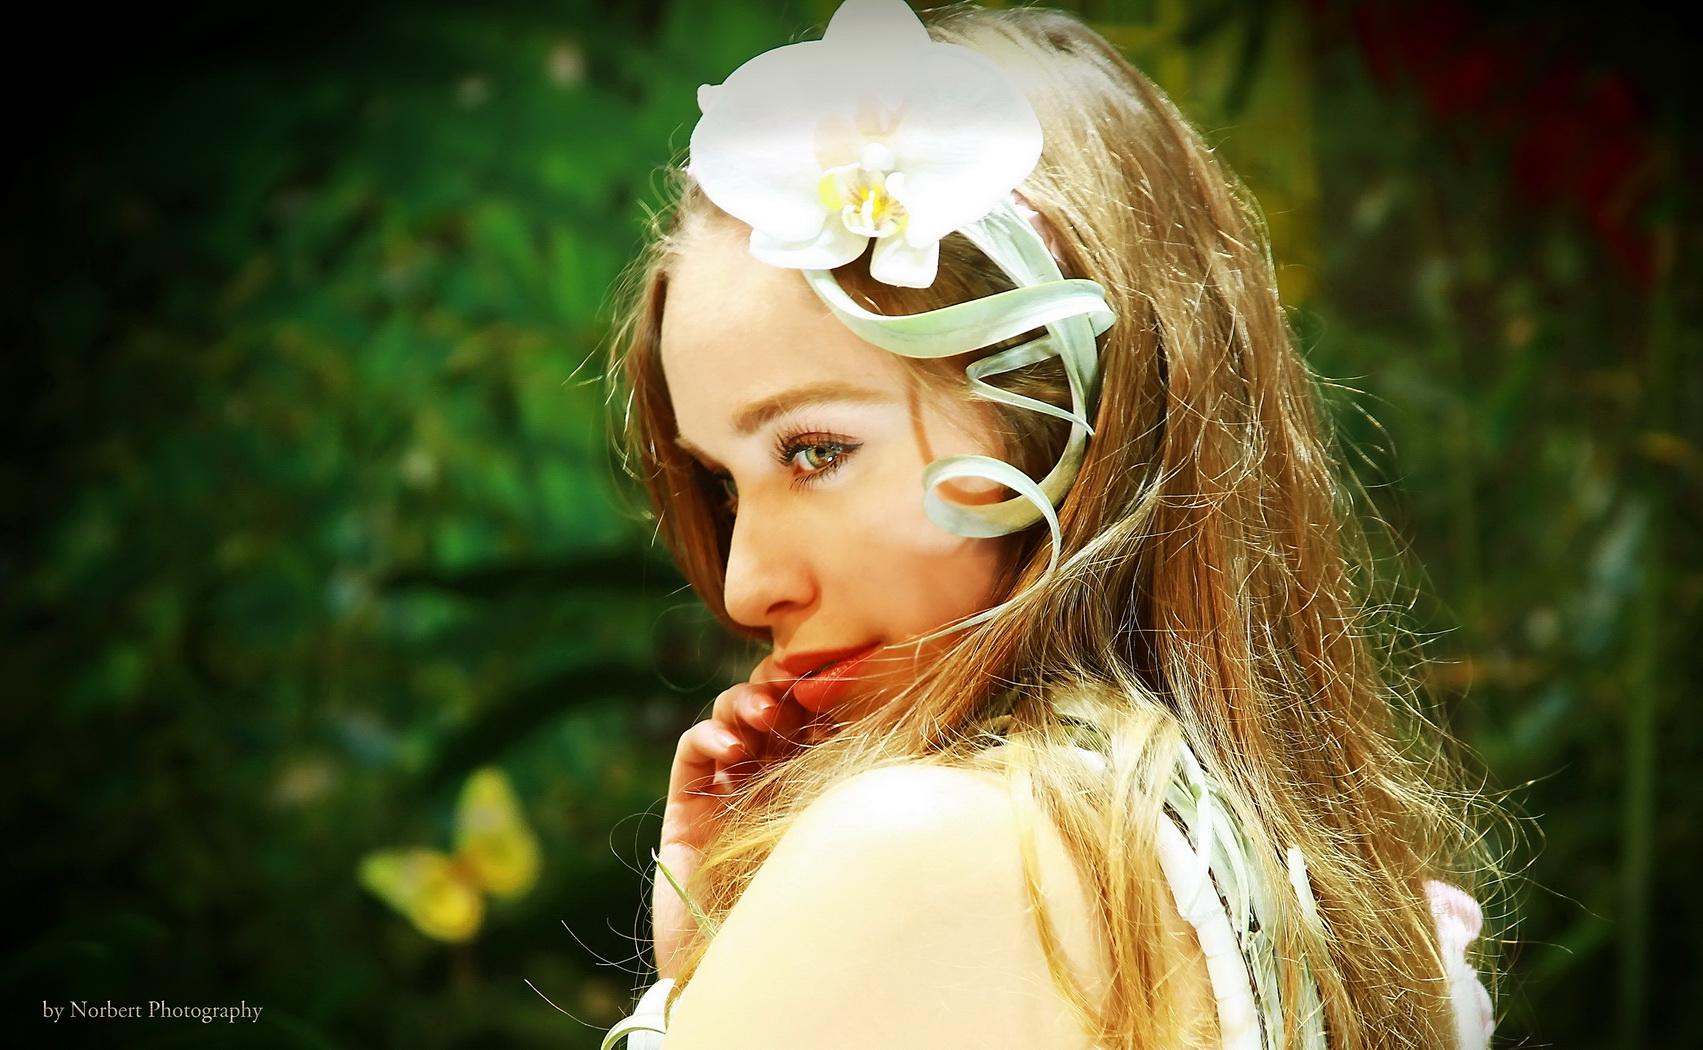 Girl-Photokina-3